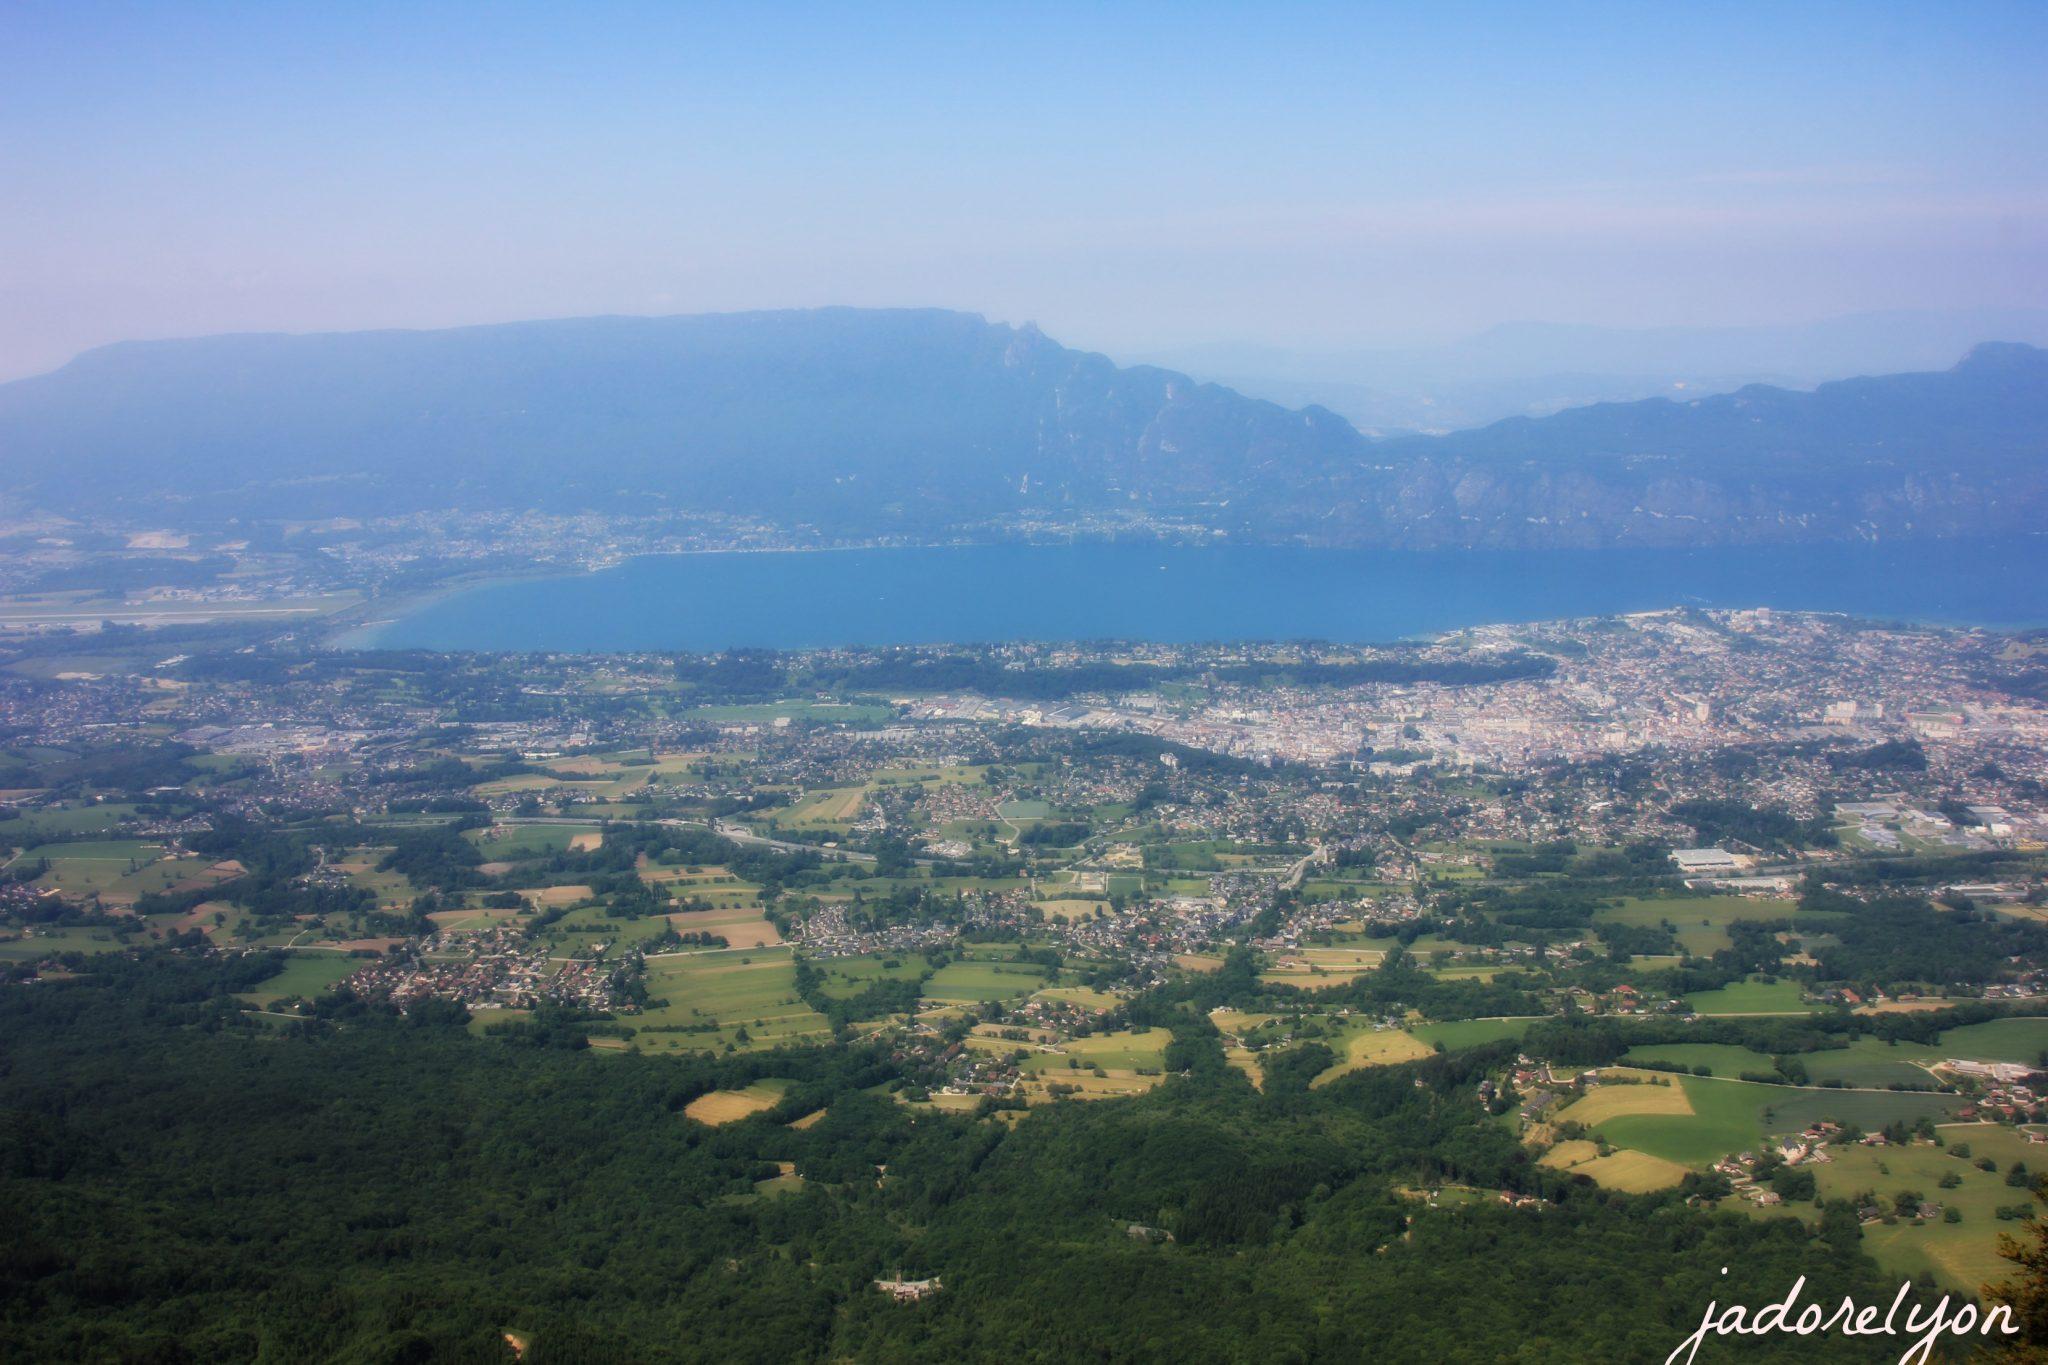 View from Belveder du Revard